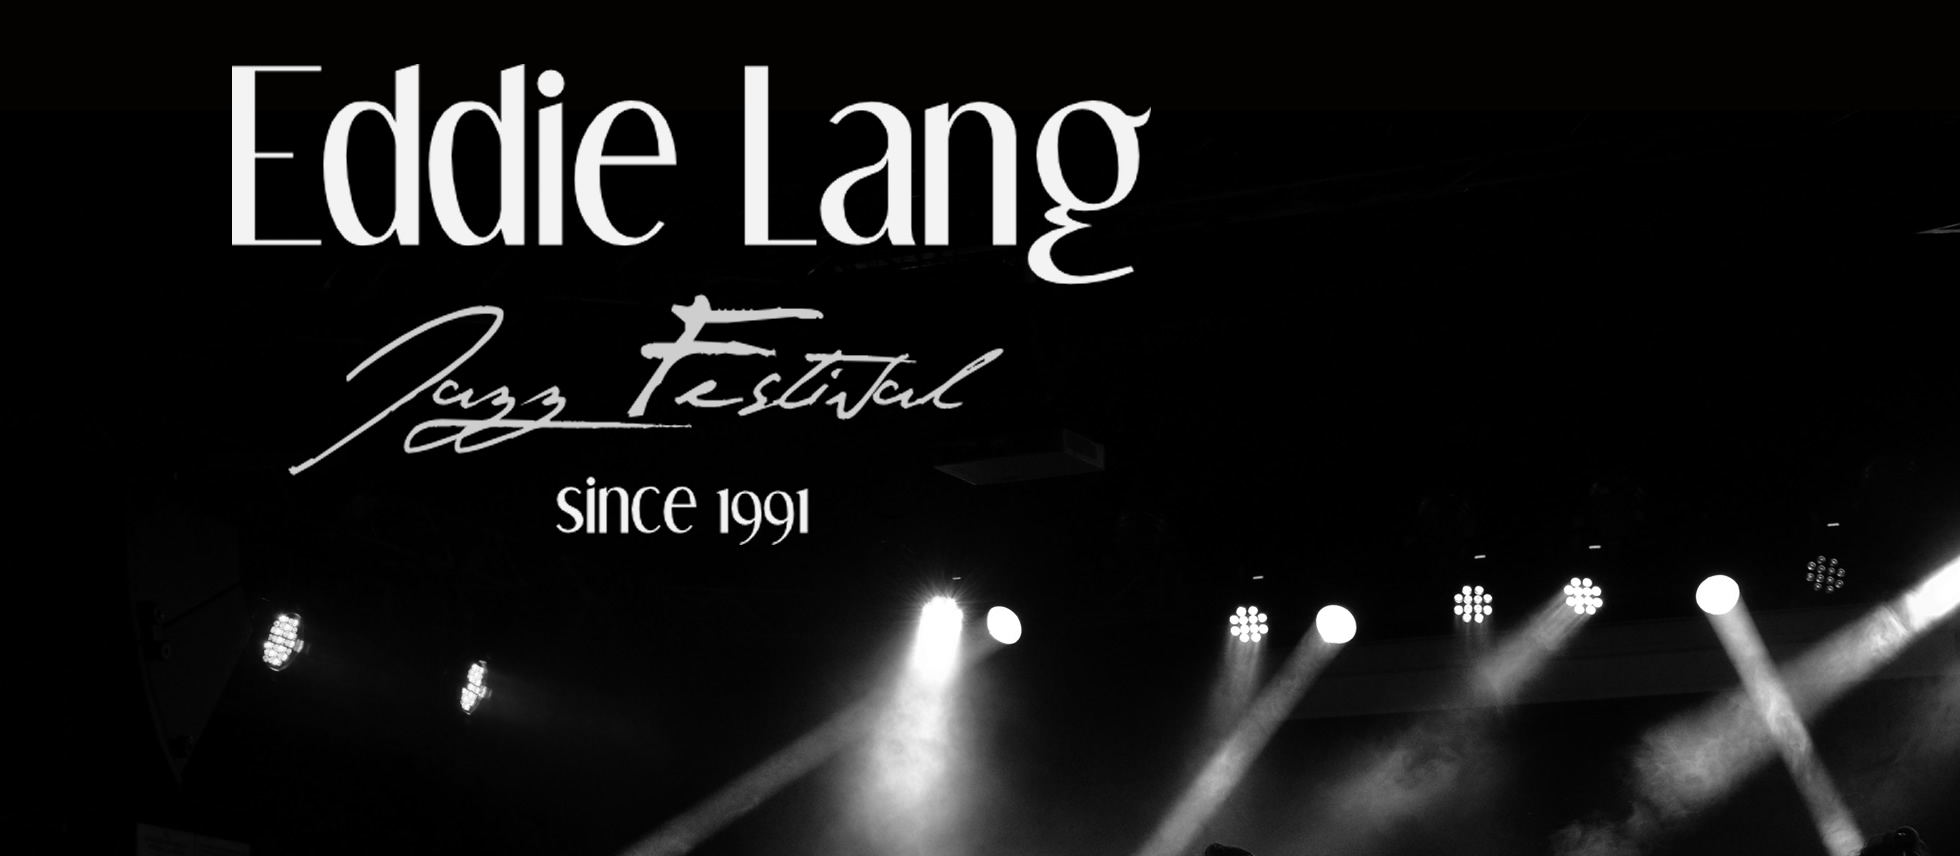 Eddie Lang Jazz festival 2014 – Il programma